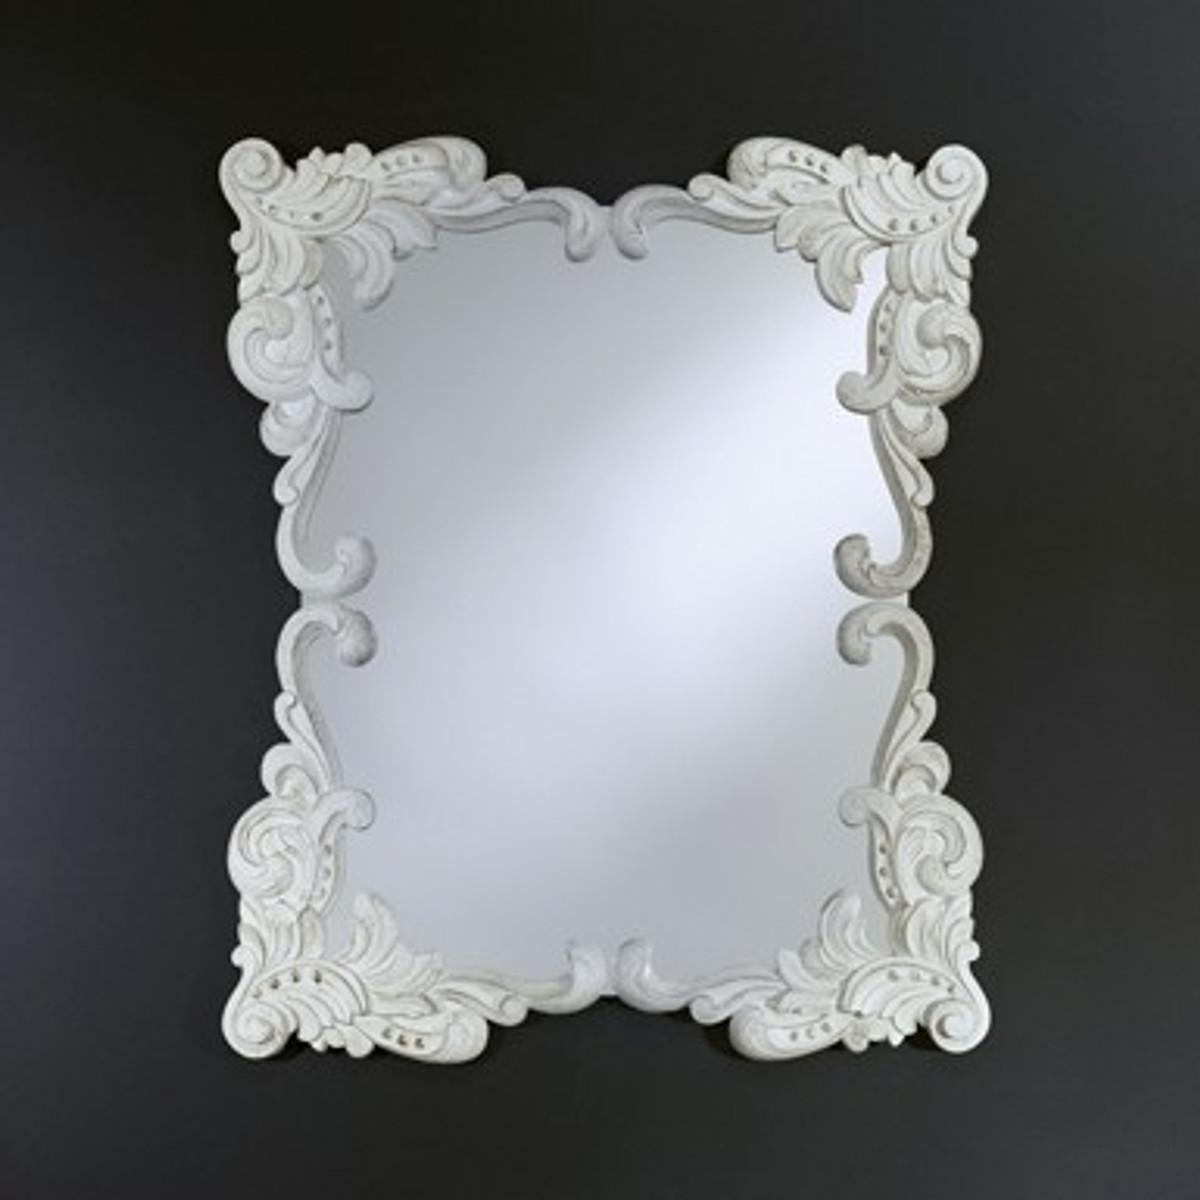 Casa Padrino Barock Wandspiegel Antik Stil Weiß 92 X 110 Cm   Barocker  Spiegel Antikweiß